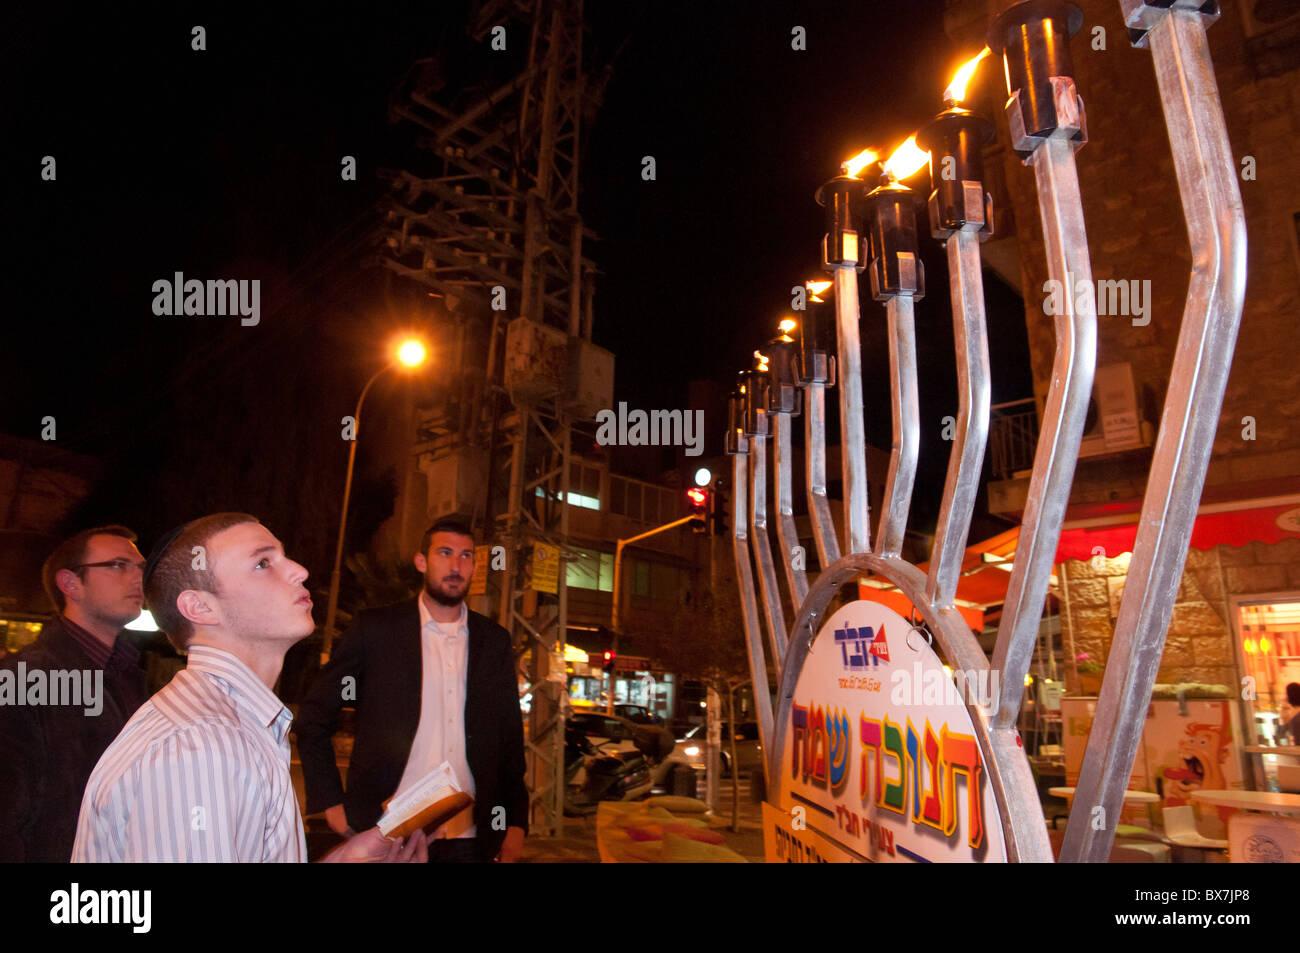 Lubavitch jews lighting a street hanukiah during the Jewish Hanukah festival. Jerusalem. israel - Stock Image